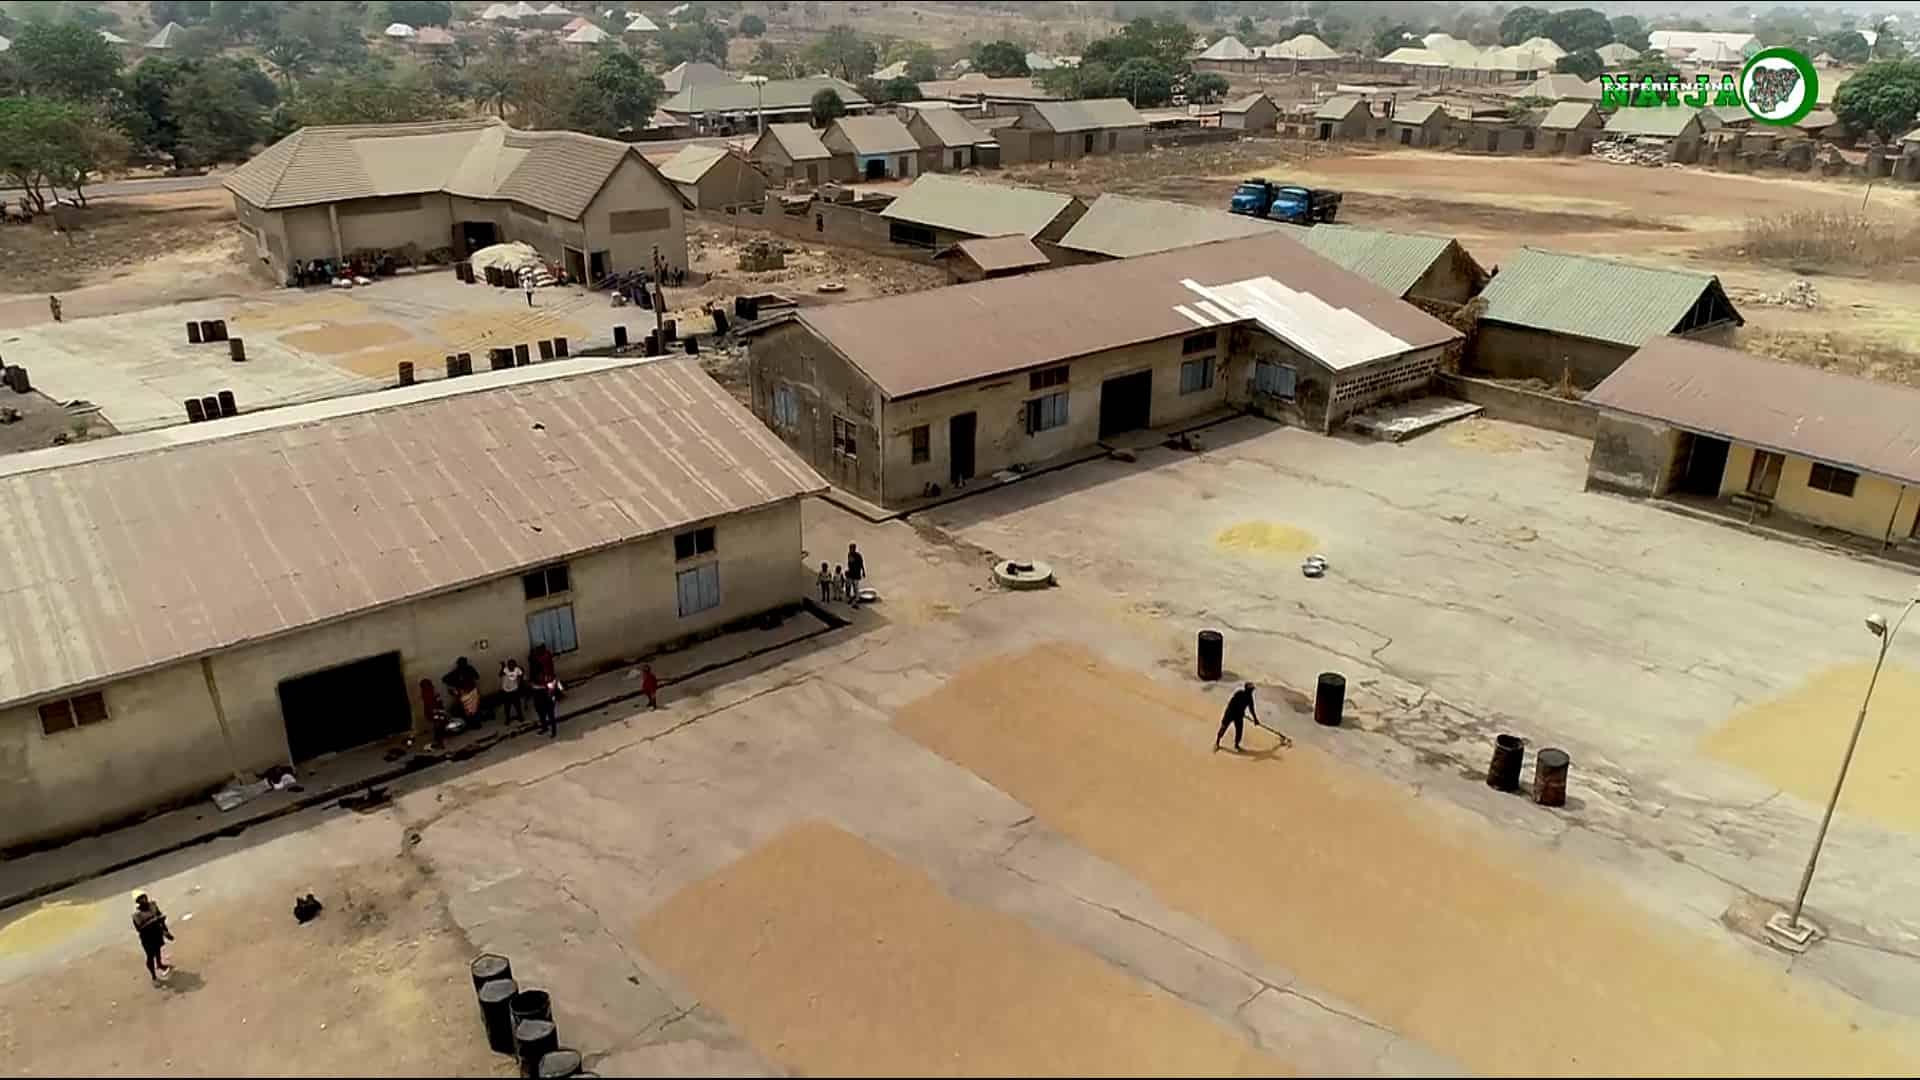 Image of Gboko Rice Mill, Benue State, Nigeria